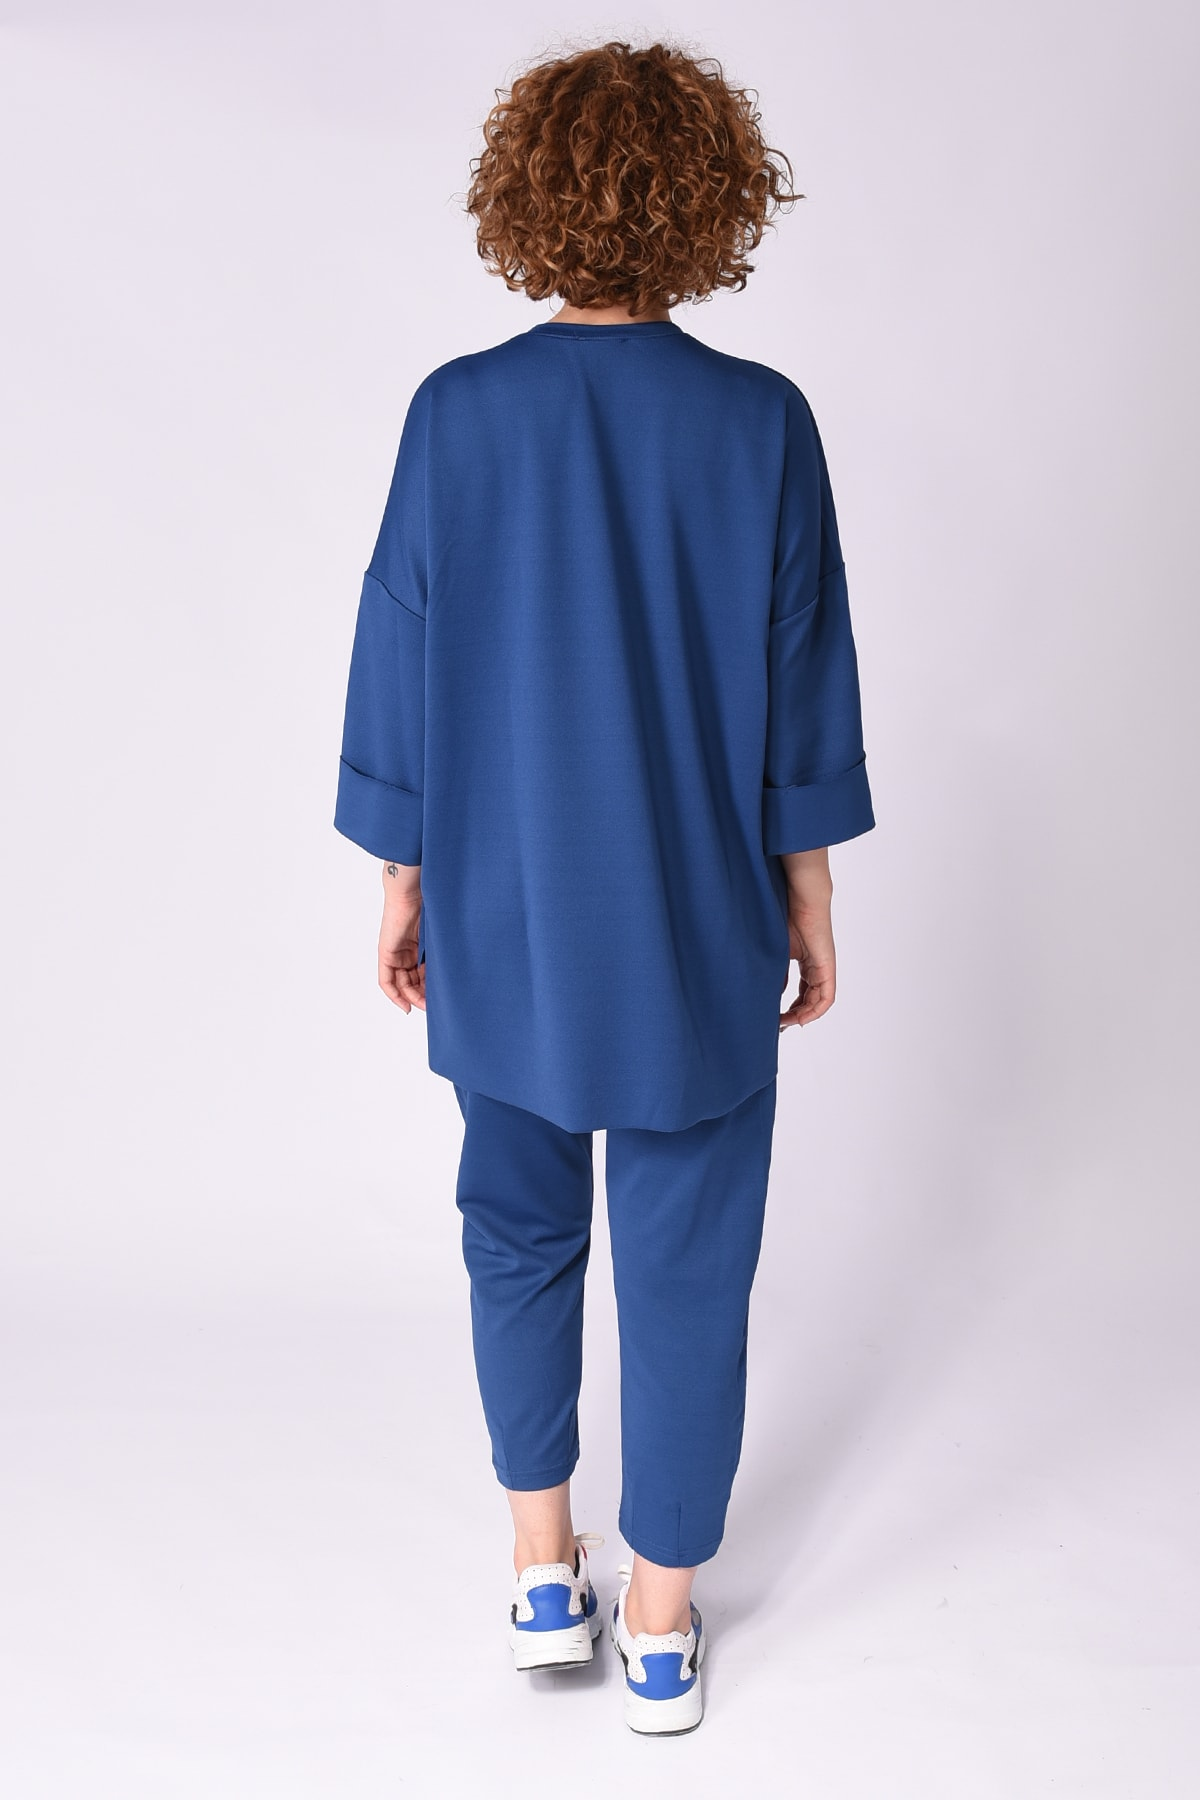 Samtoni Kadın Lacivert Sweatshirt Alt Üst Takım 2